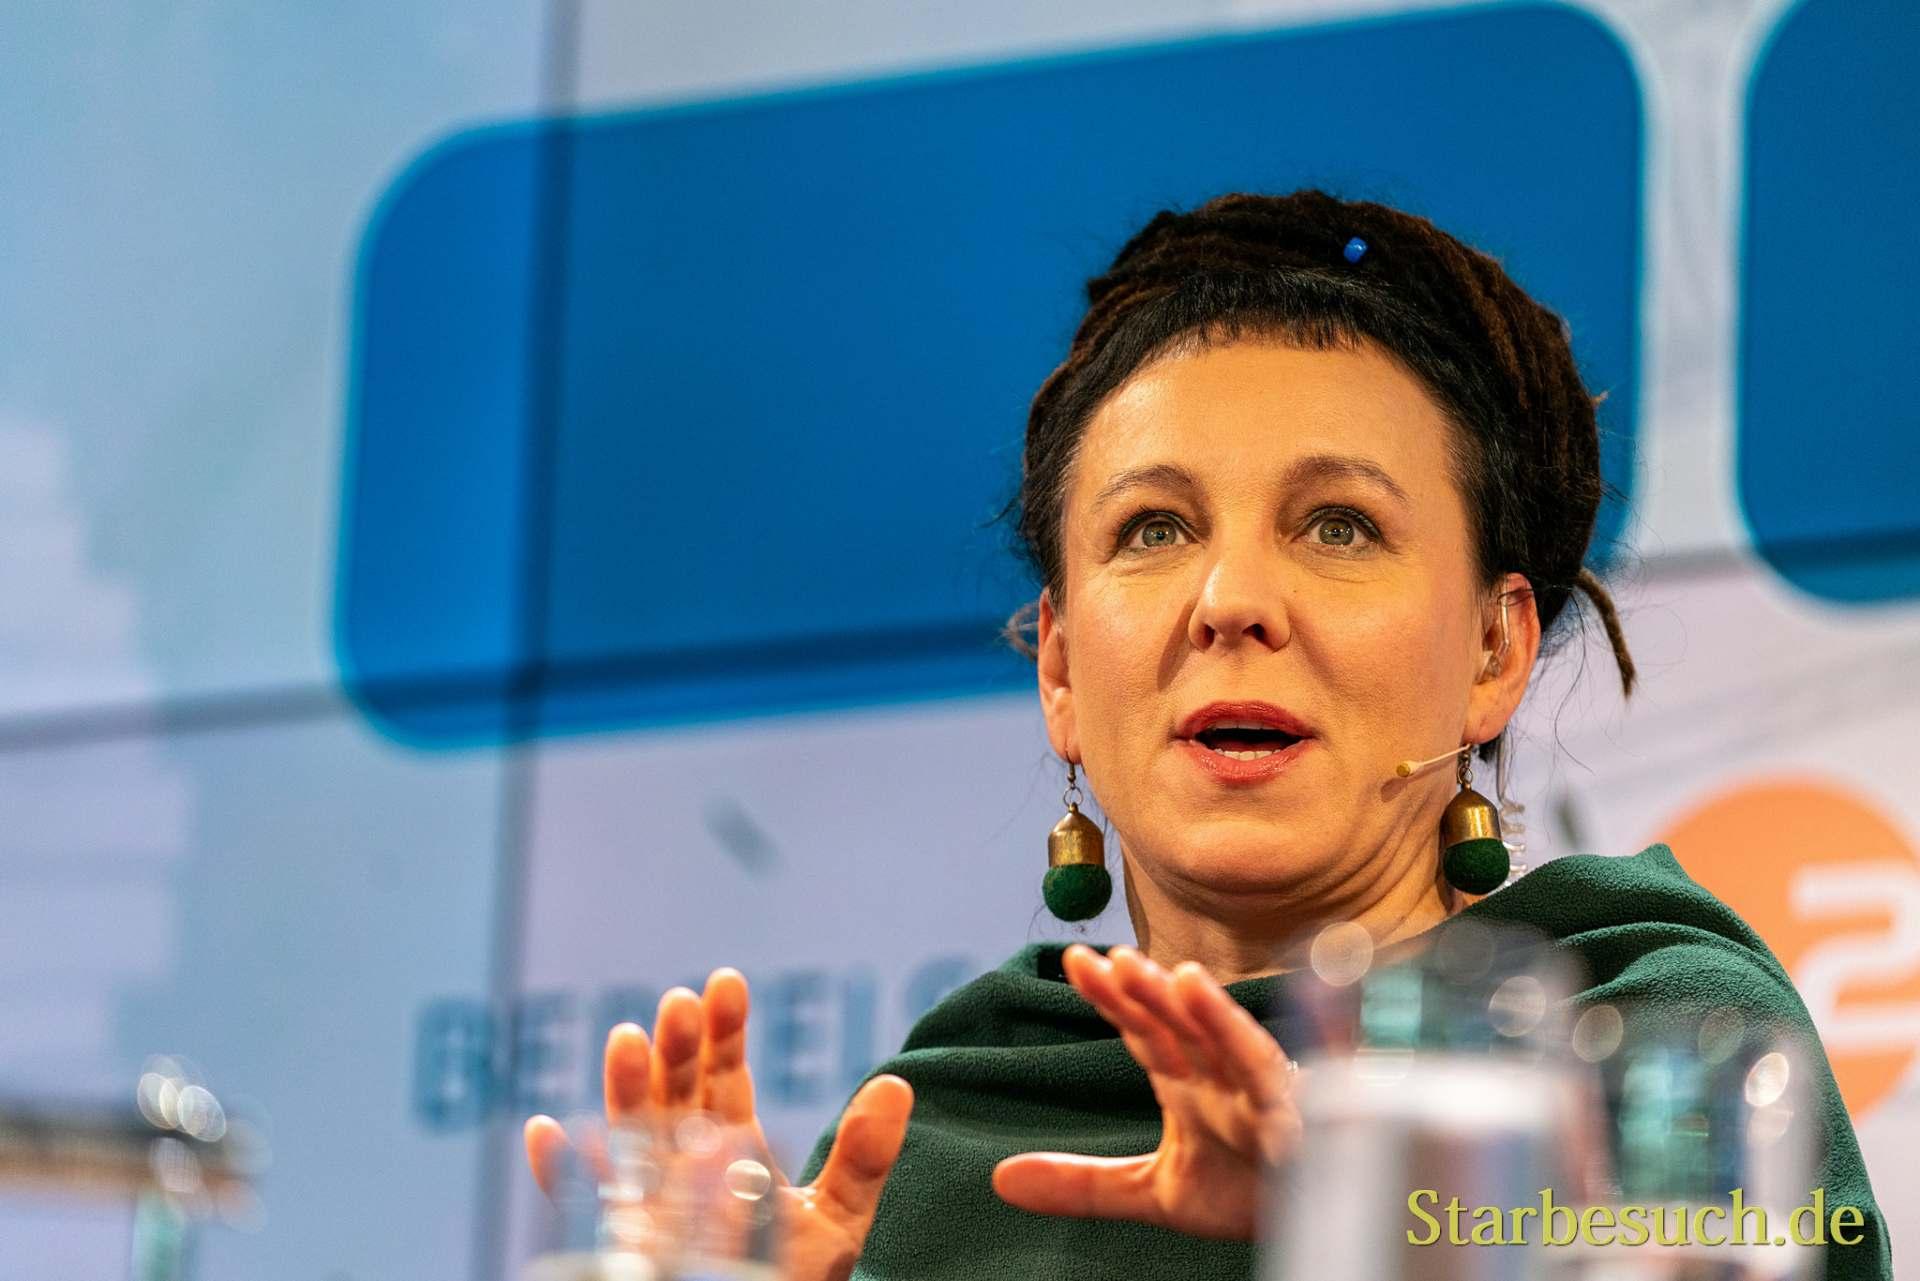 Nobelpreisträgerin 2018: Olga Tokarczuk